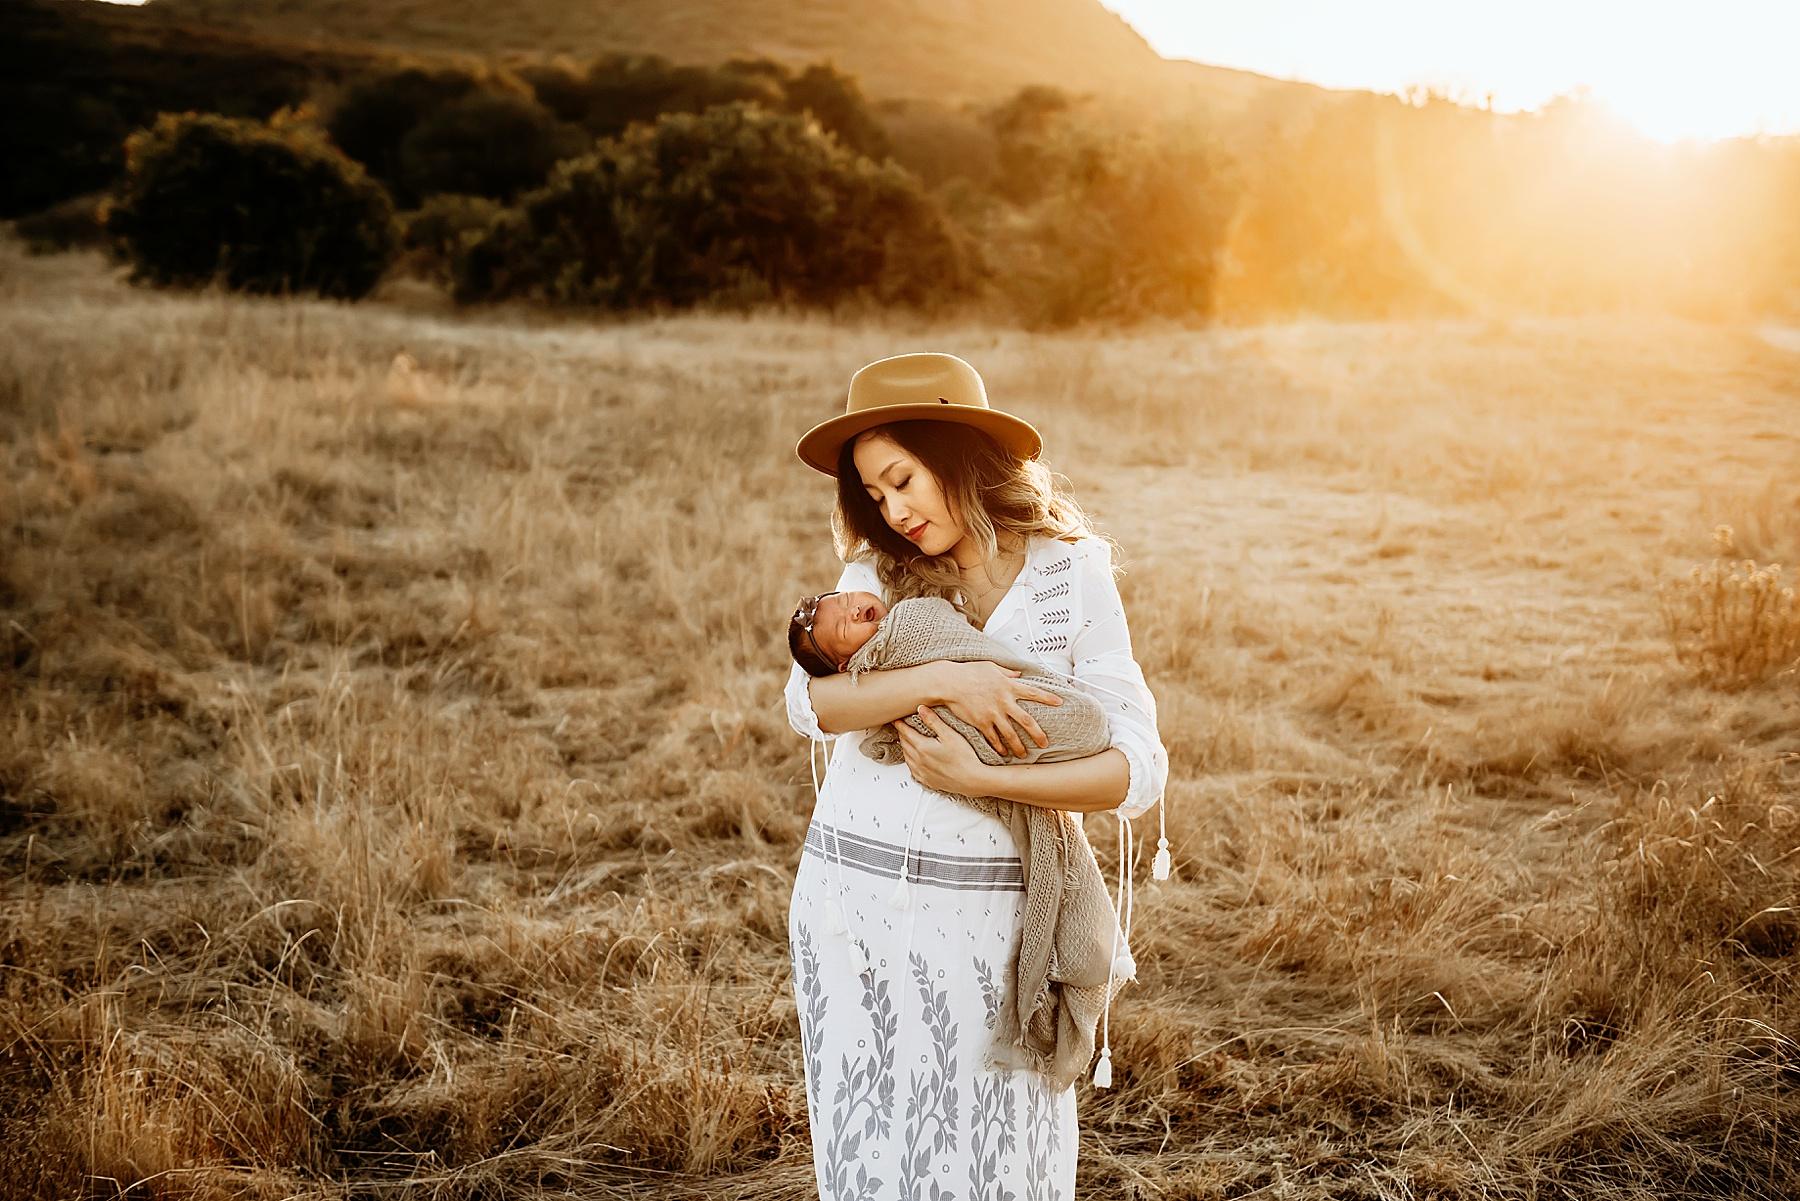 newborn pictures in open field mom baby girl